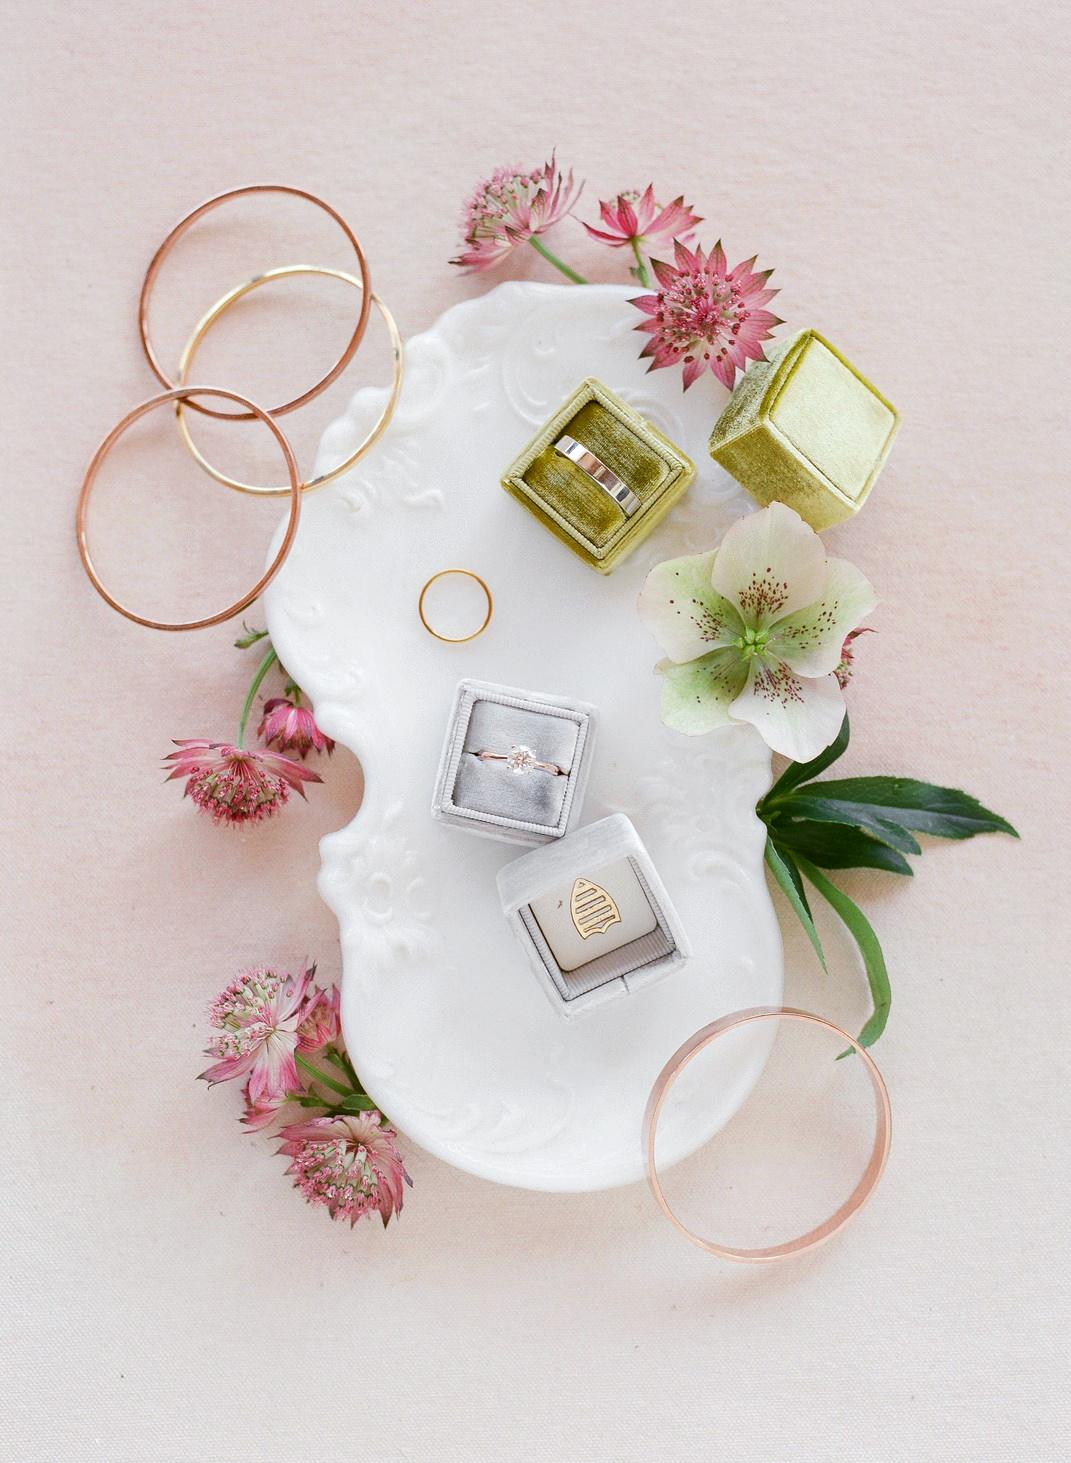 natasha nick wedding california jewelry